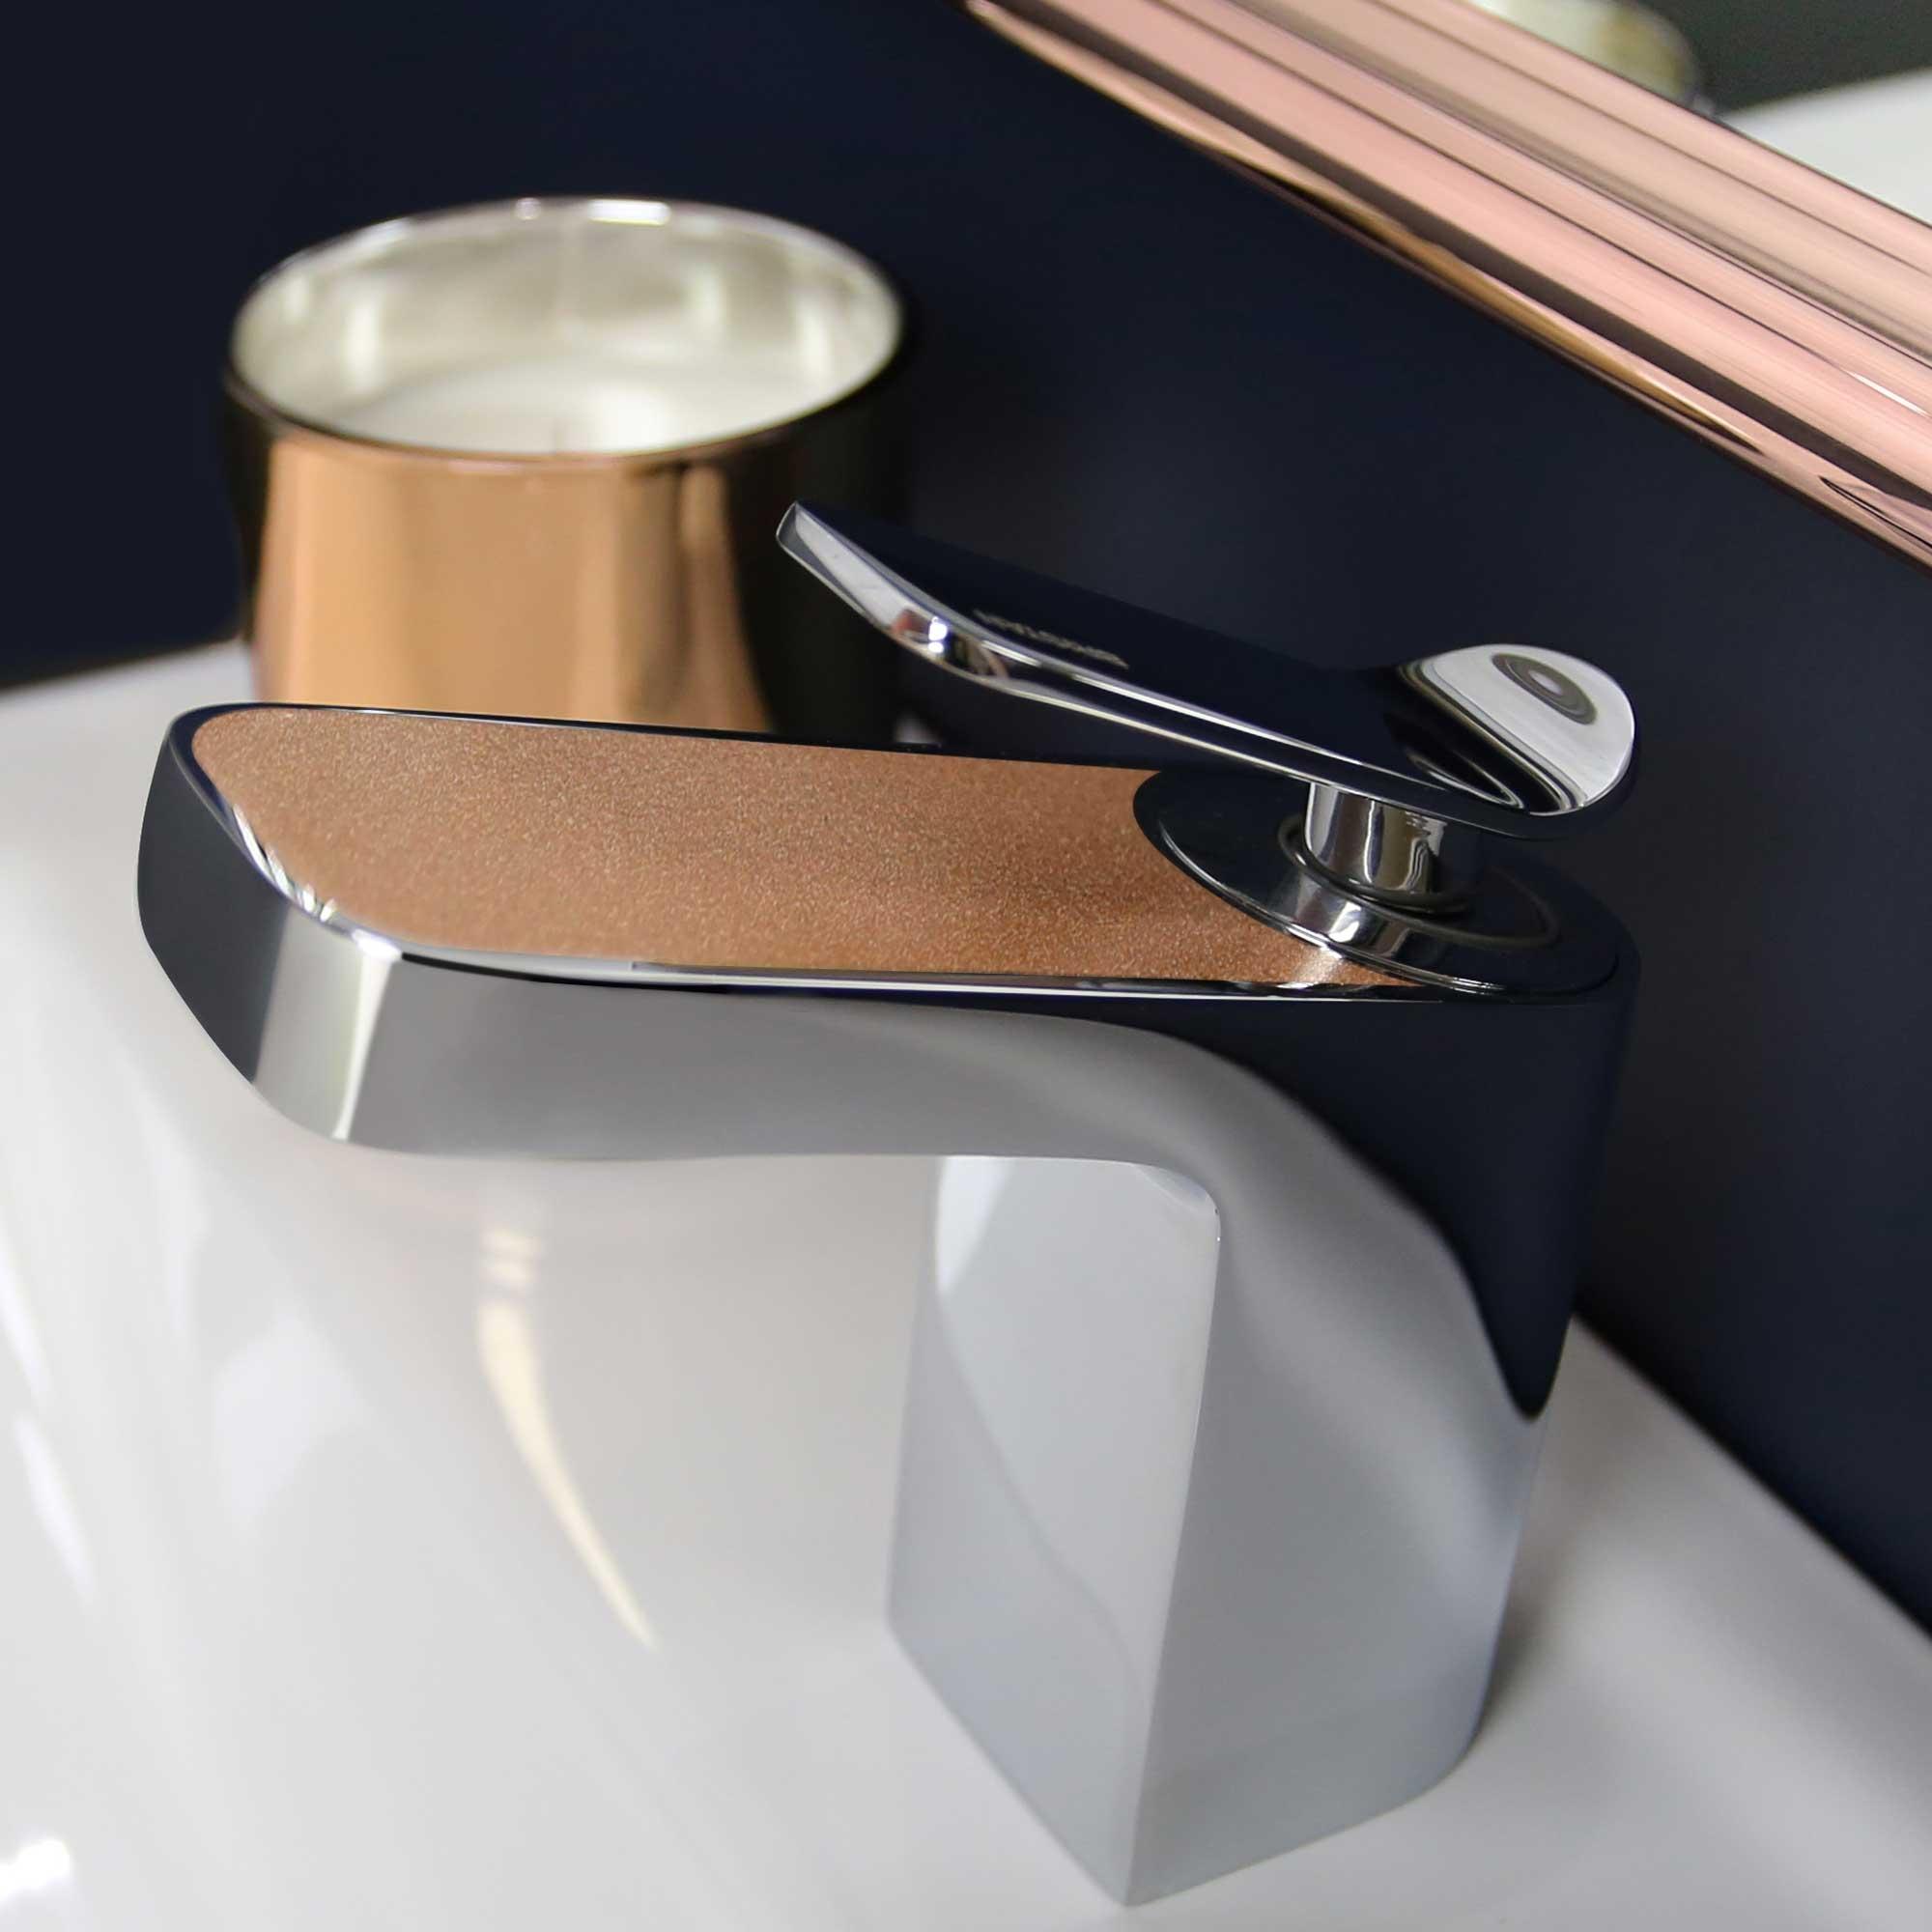 Bristan Metallix Alp Basin Mixer Tap with Clicker Waste - Copper Radiance